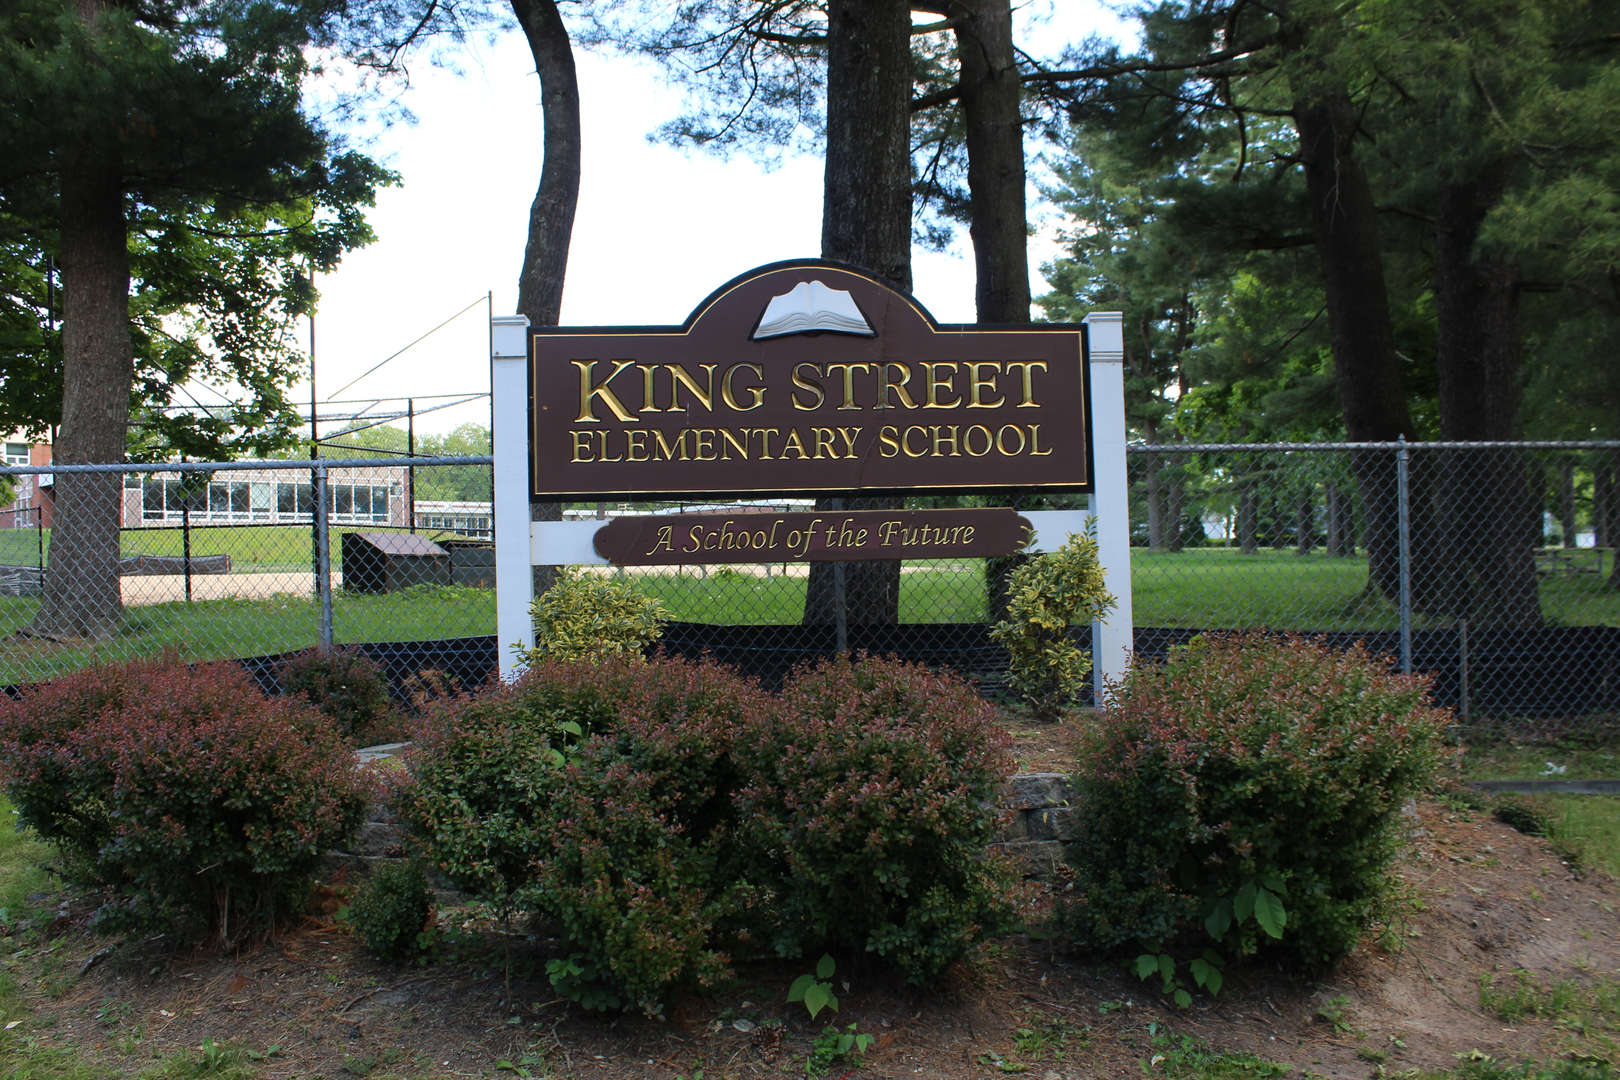 King Street Elementary School sign